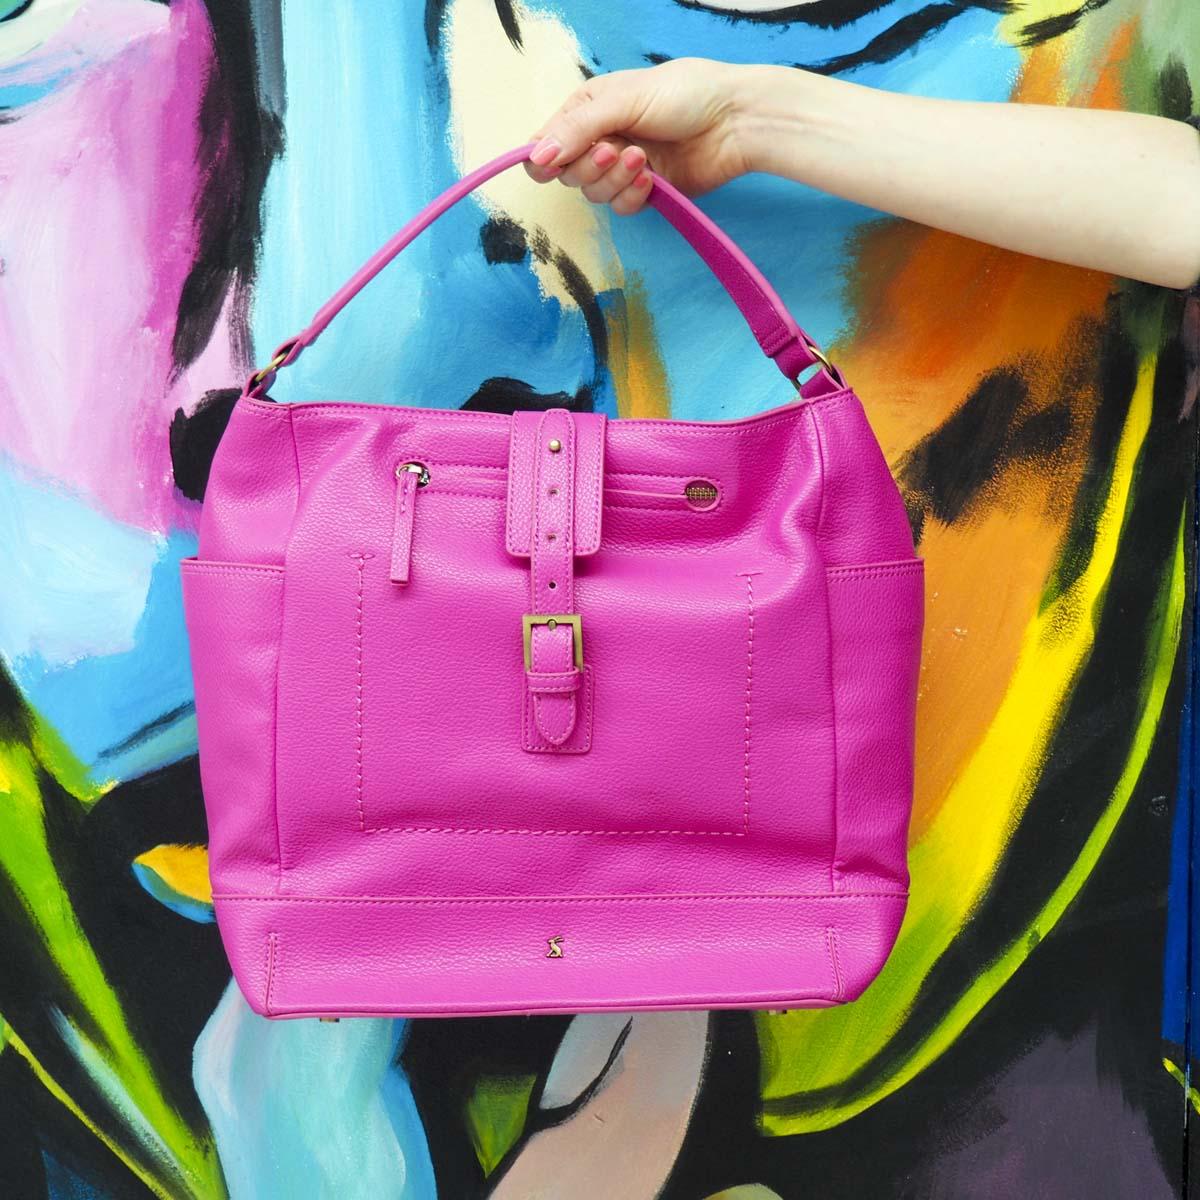 Pink Joules bag